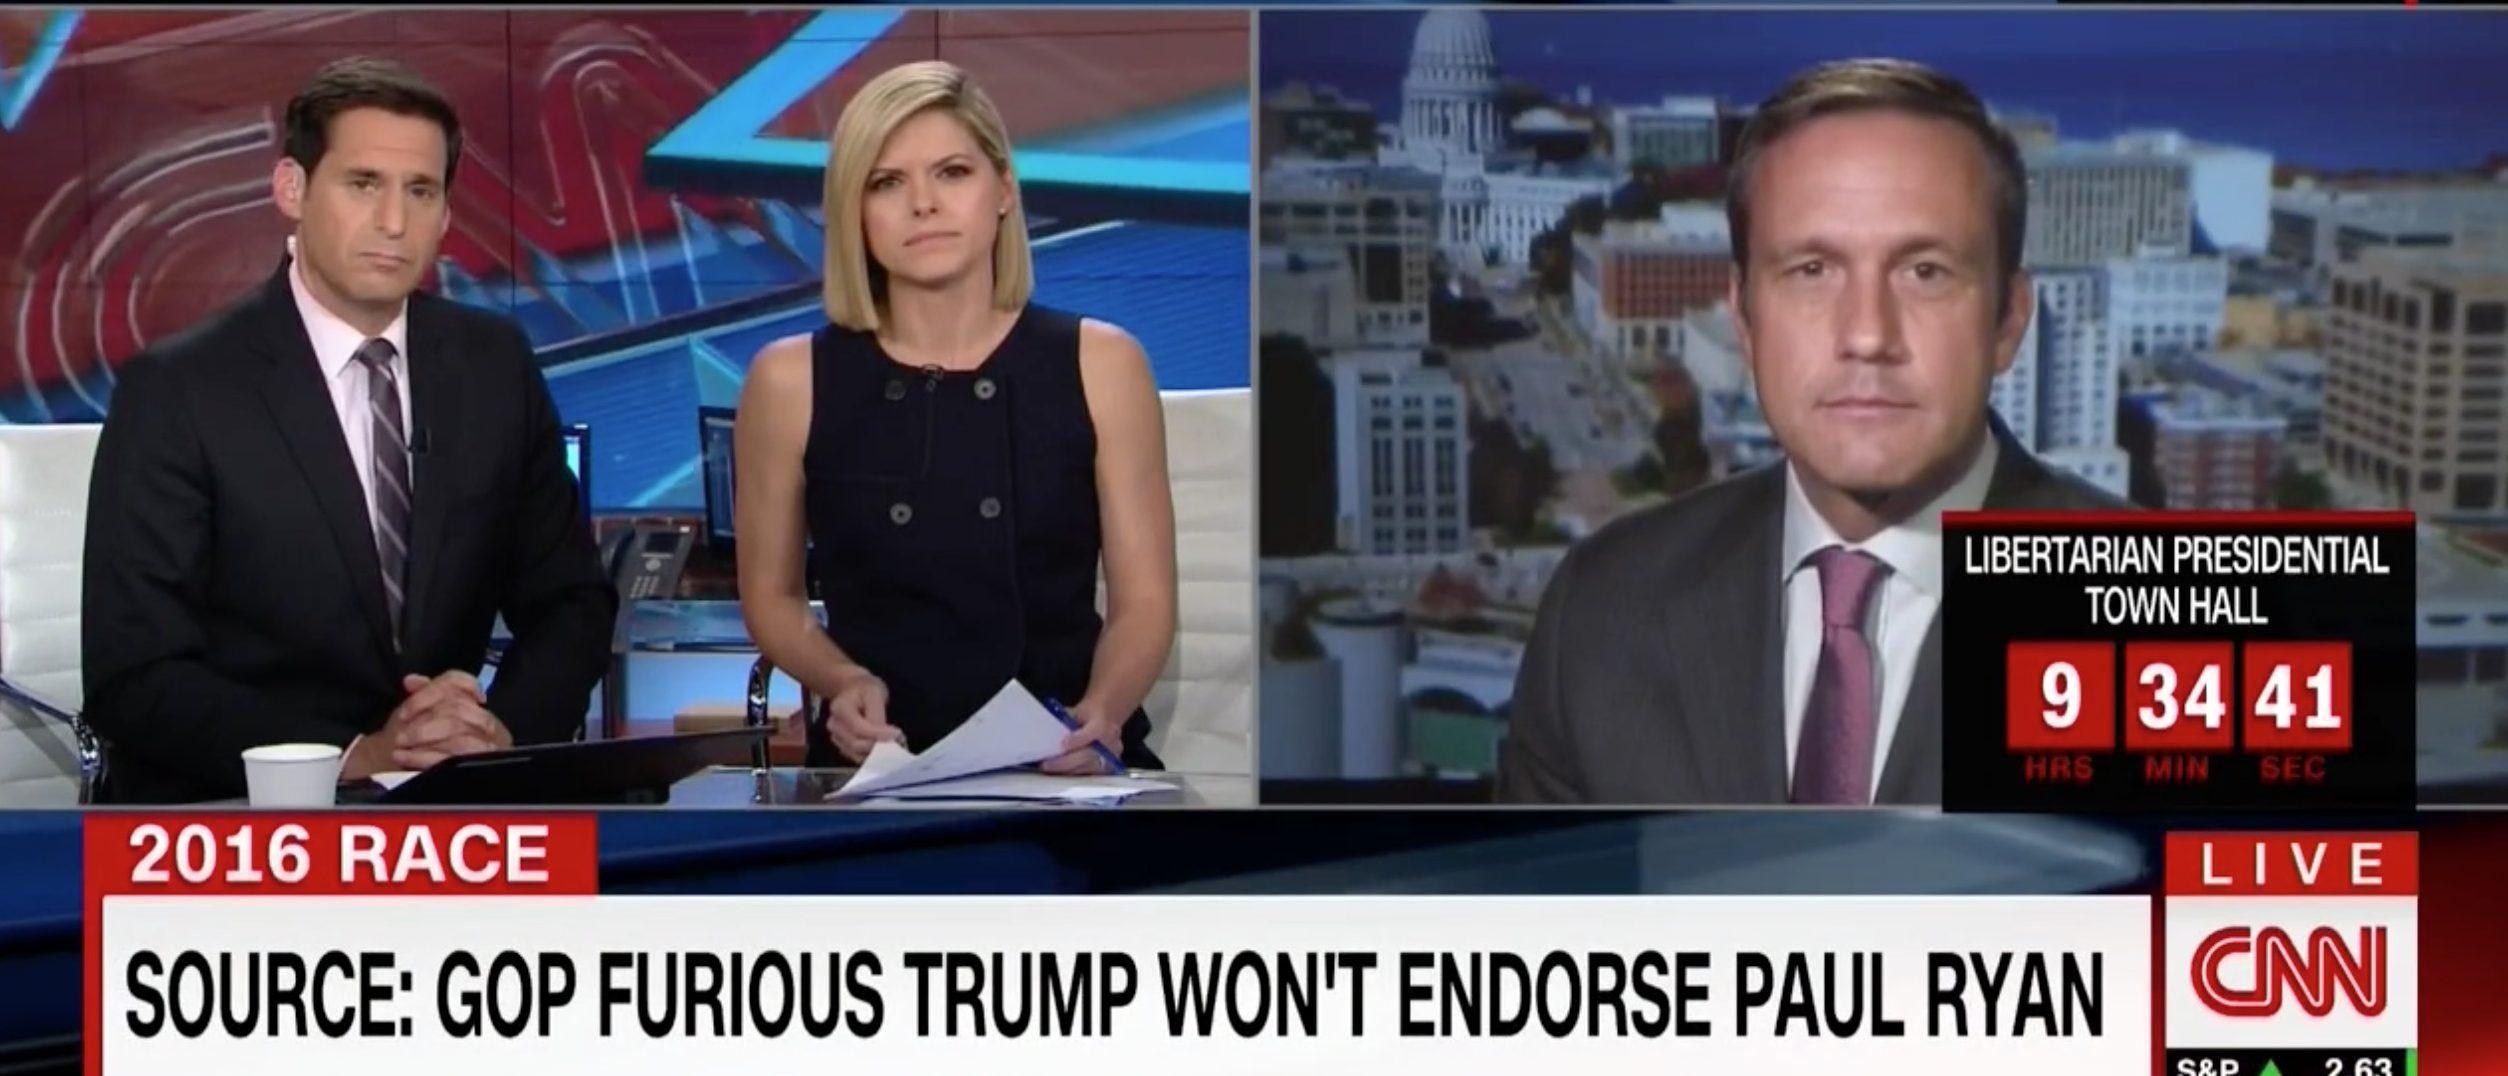 Paul Nehlen, Screen Grab CNN, 8-3-2016